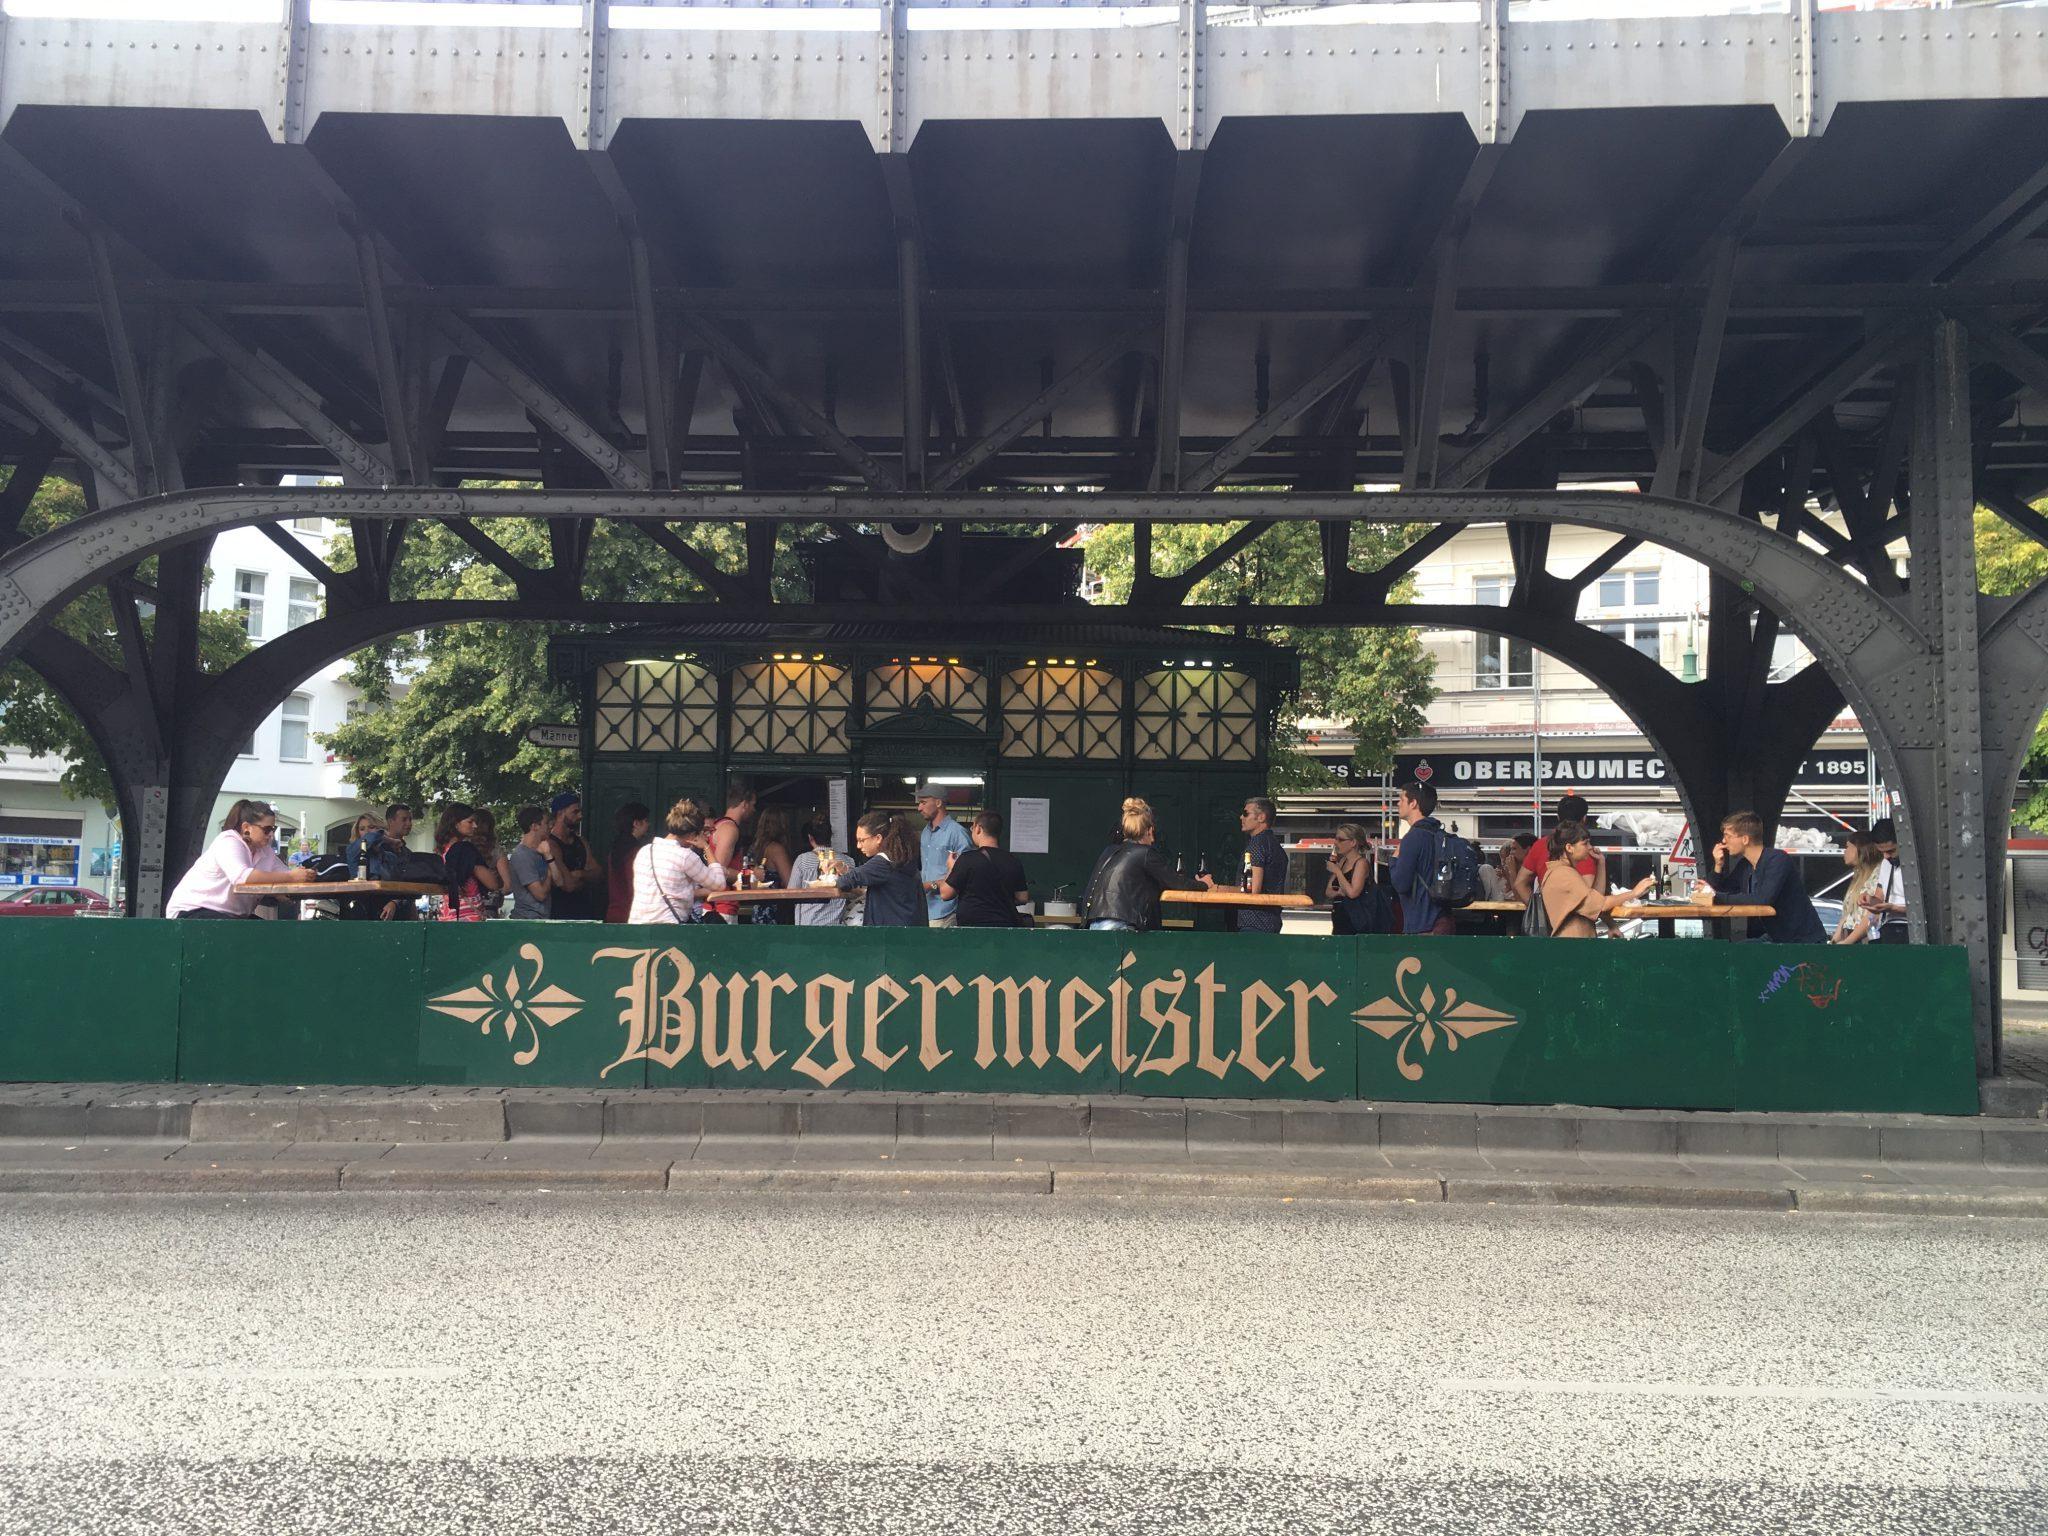 Burgemeister